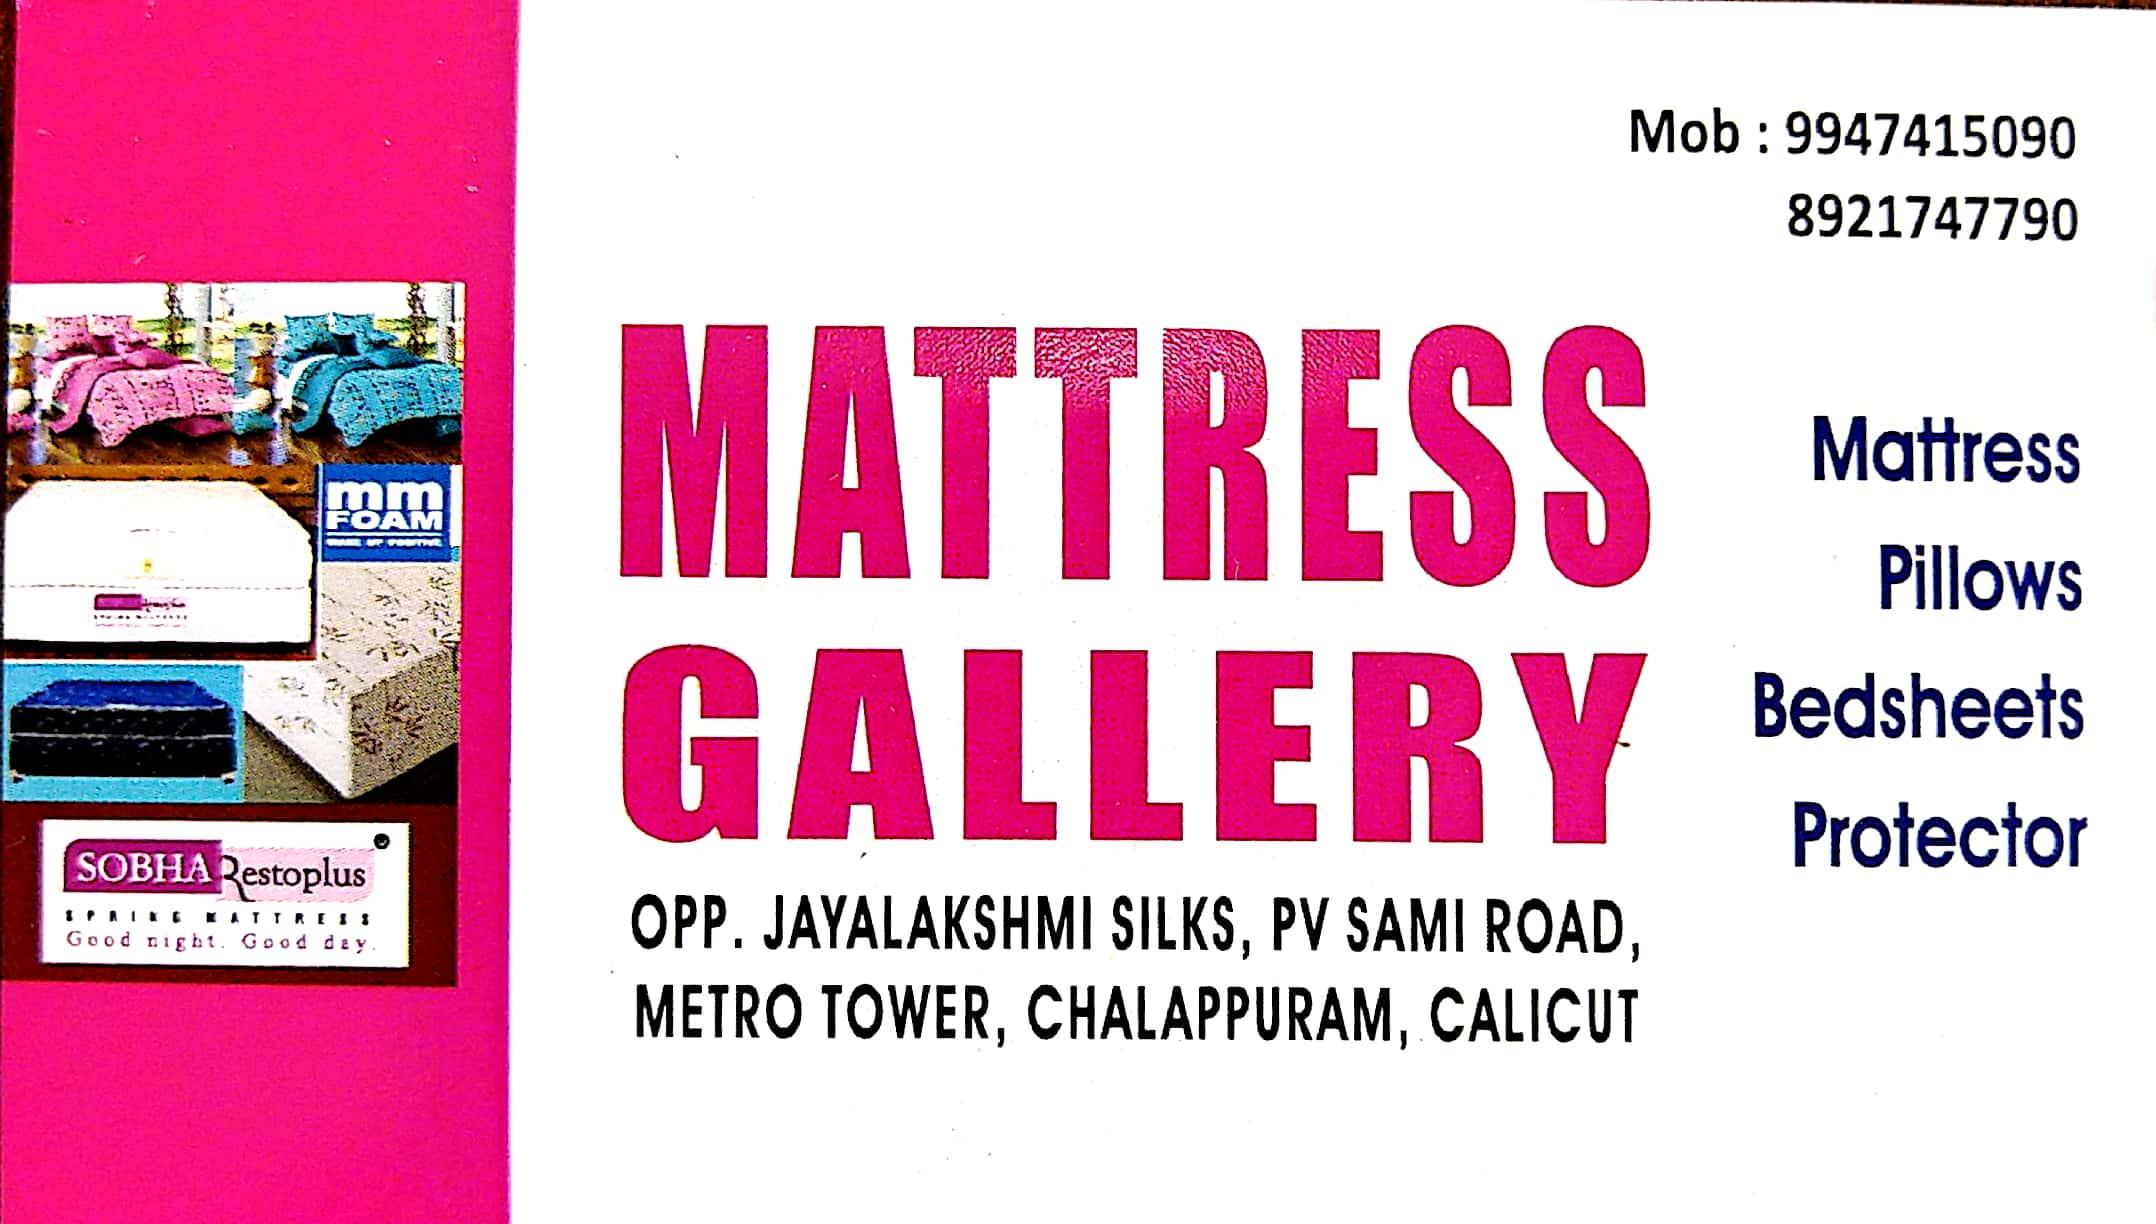 MATTRESS GALLERY, MATTRESSES,  service in Kozhikode Town, Kozhikode